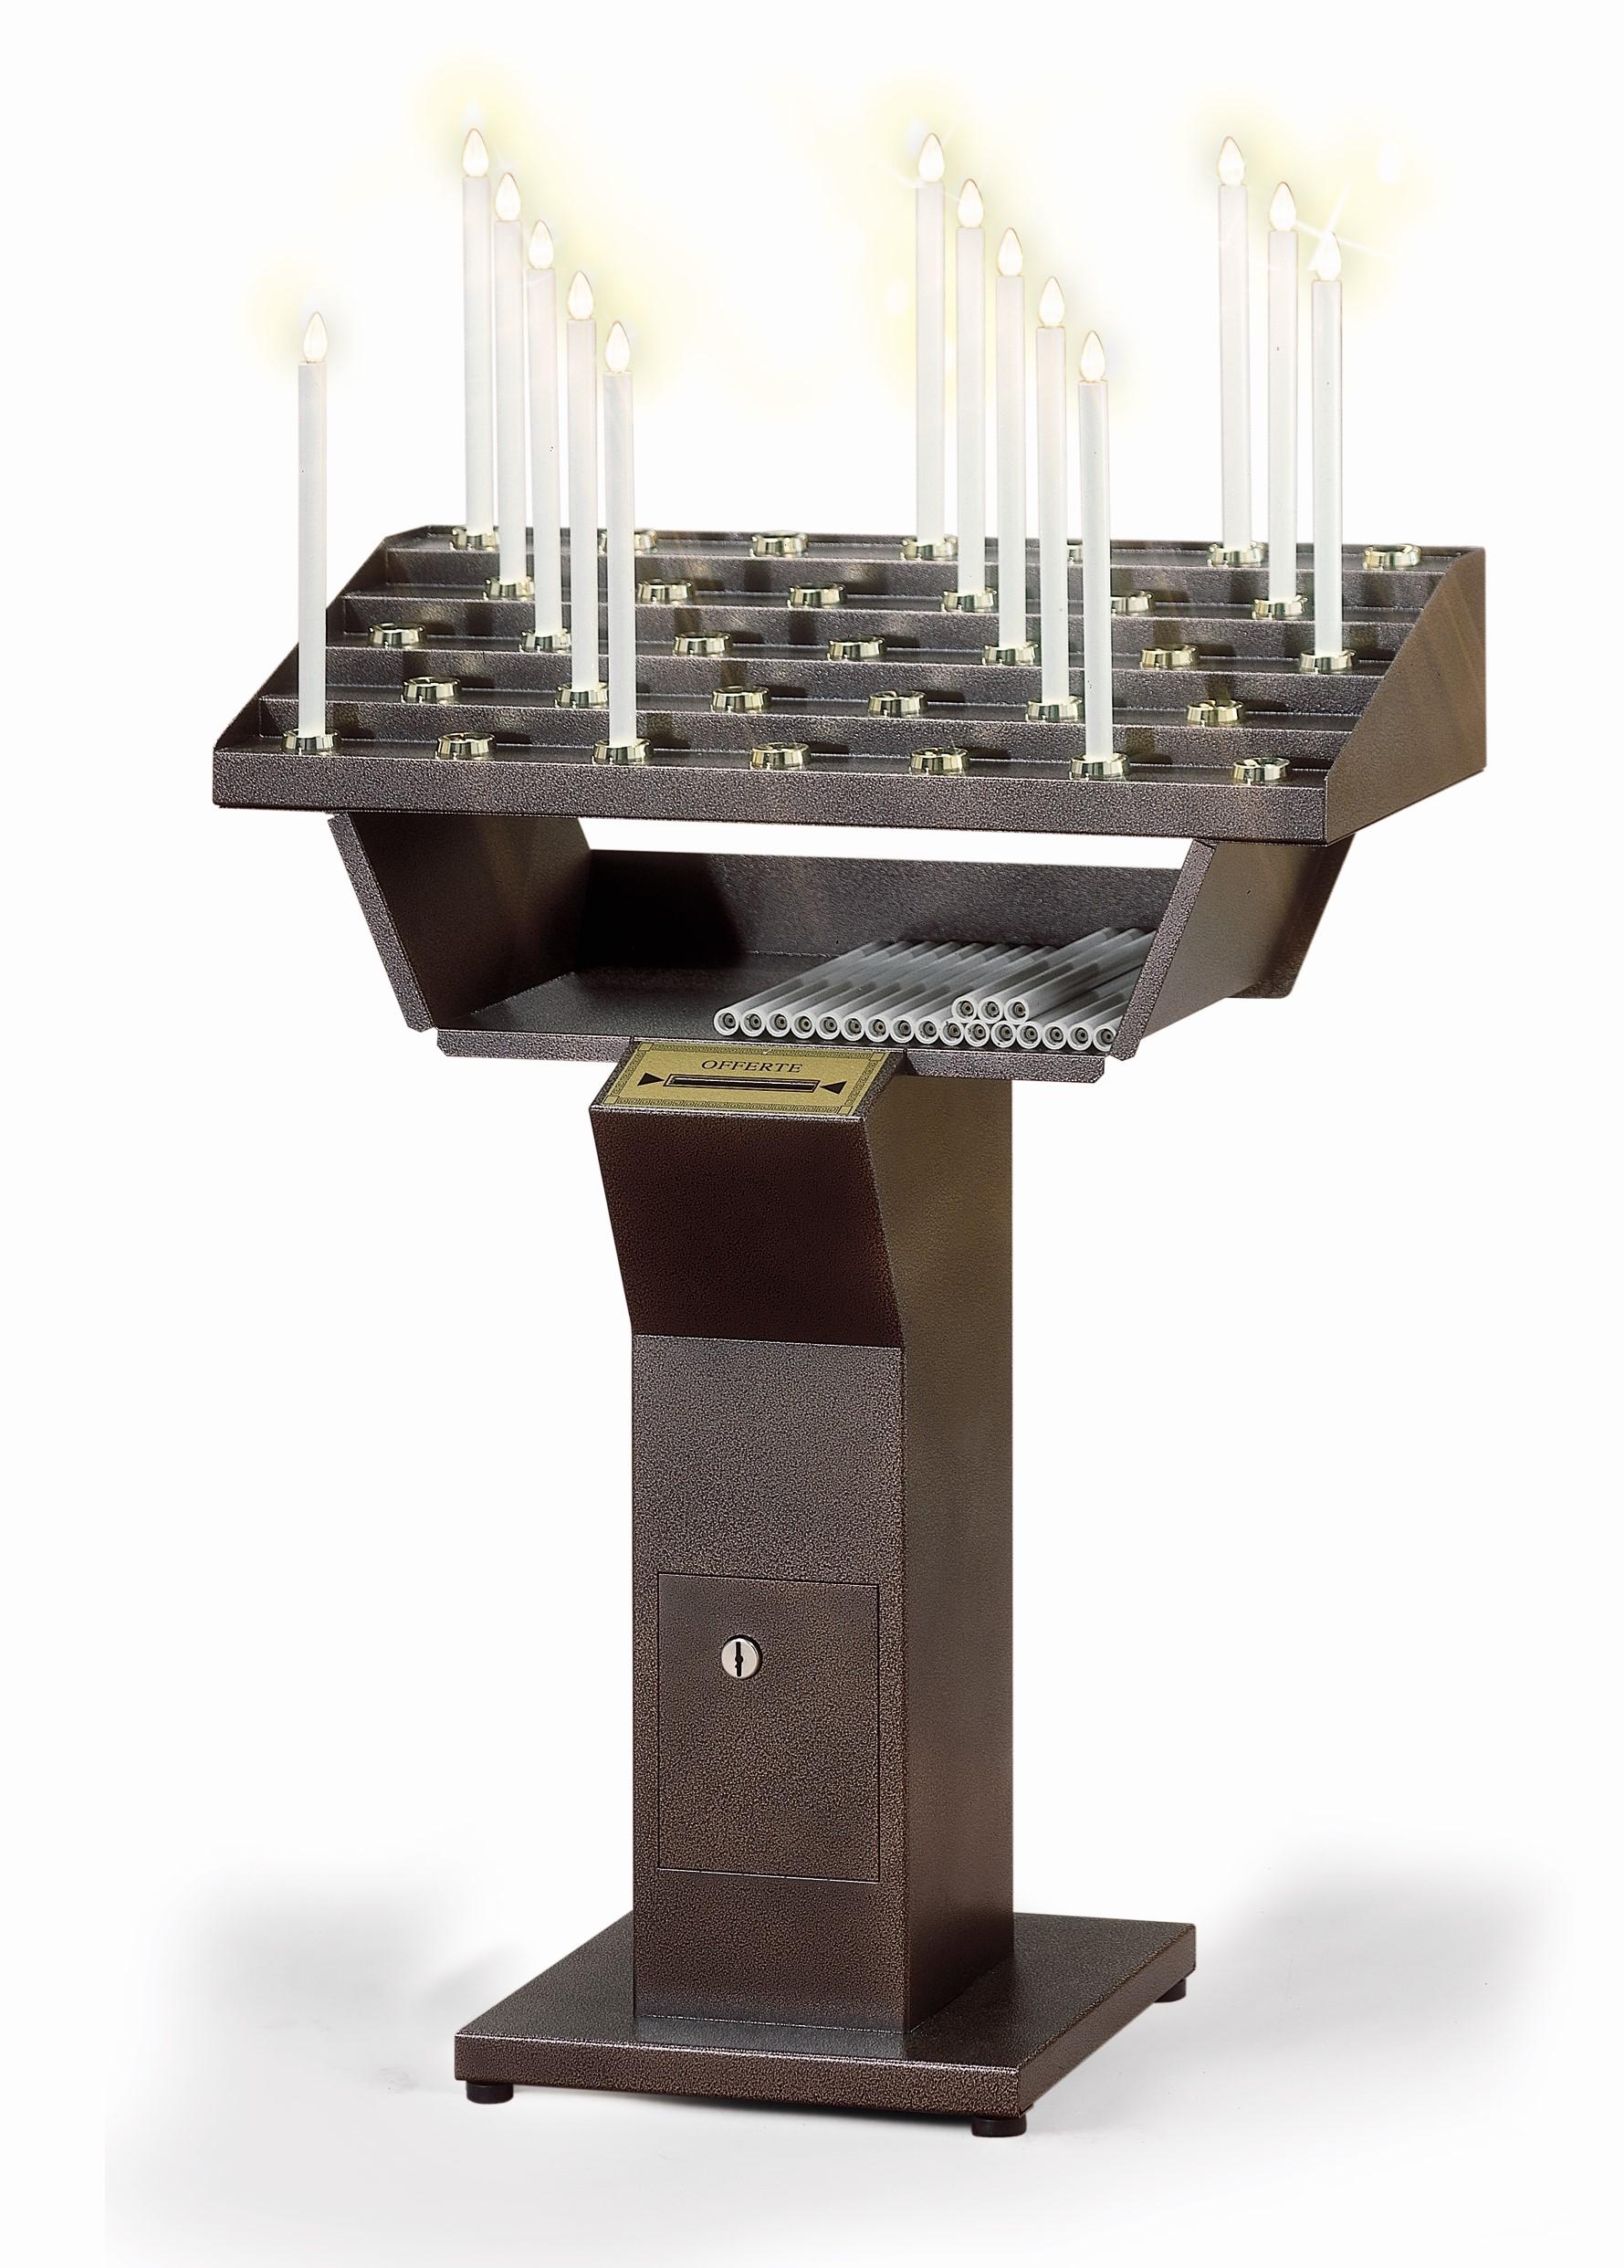 Candeliere Elettrico Gestuale per Chiese a 33 accensioni